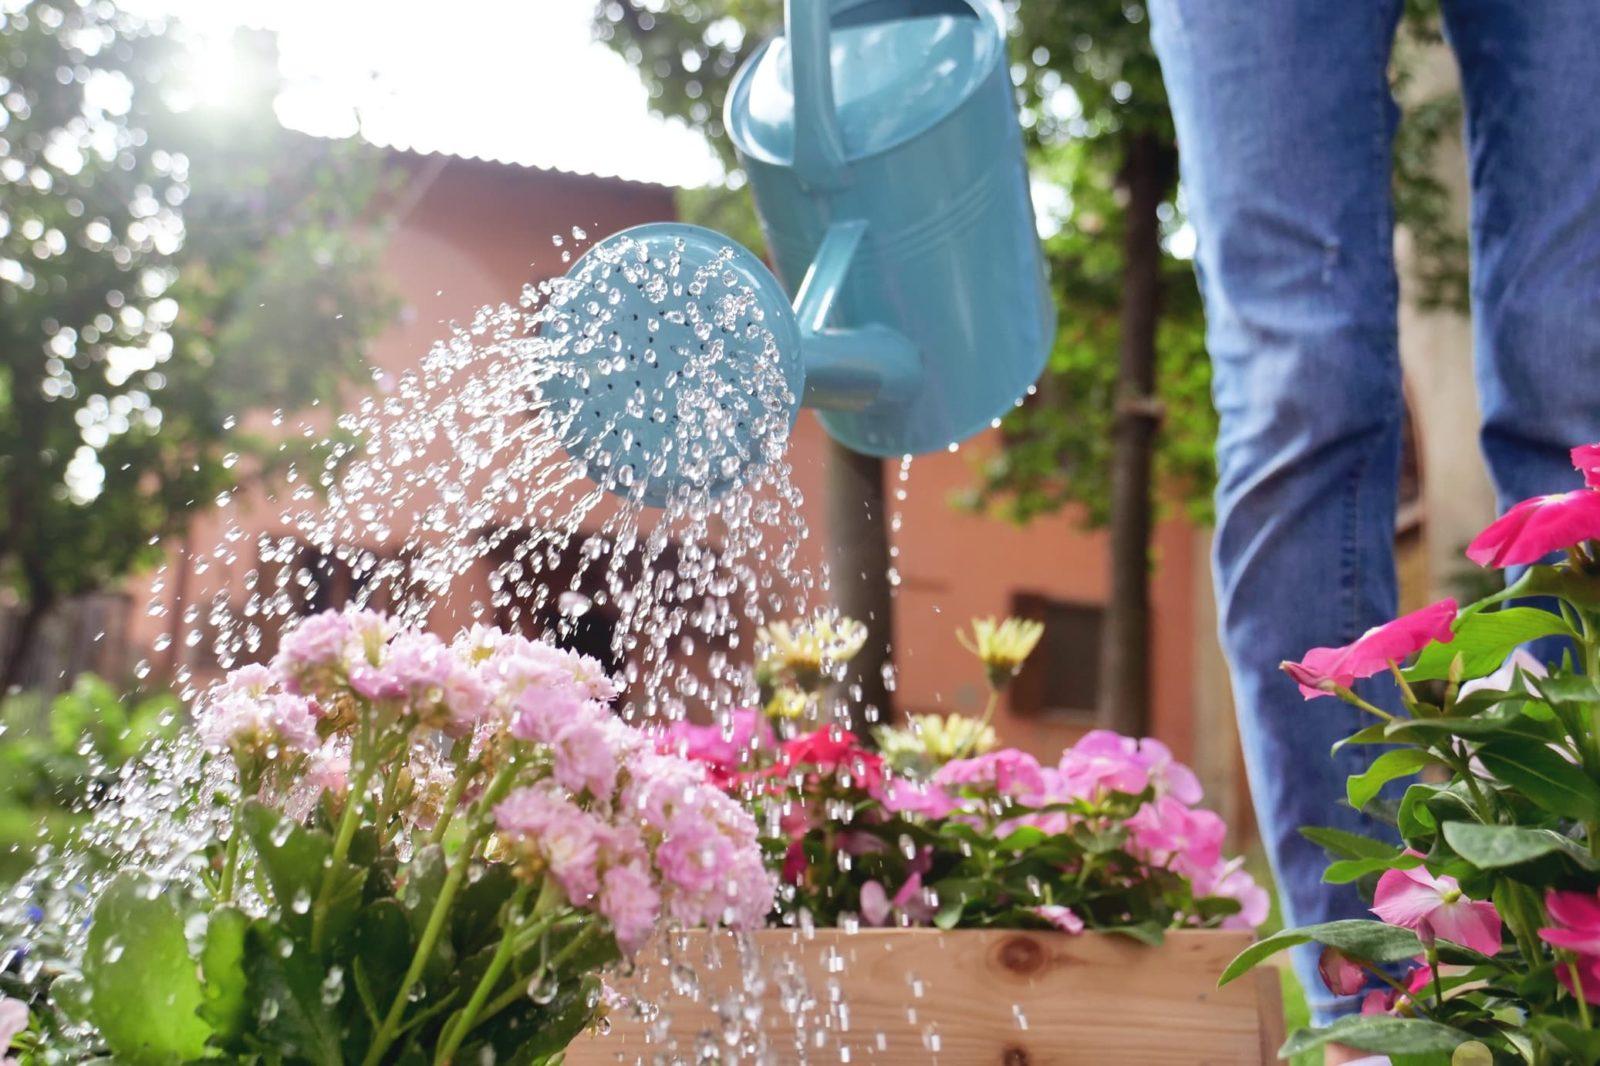 woman watering pink flowering plants in garden